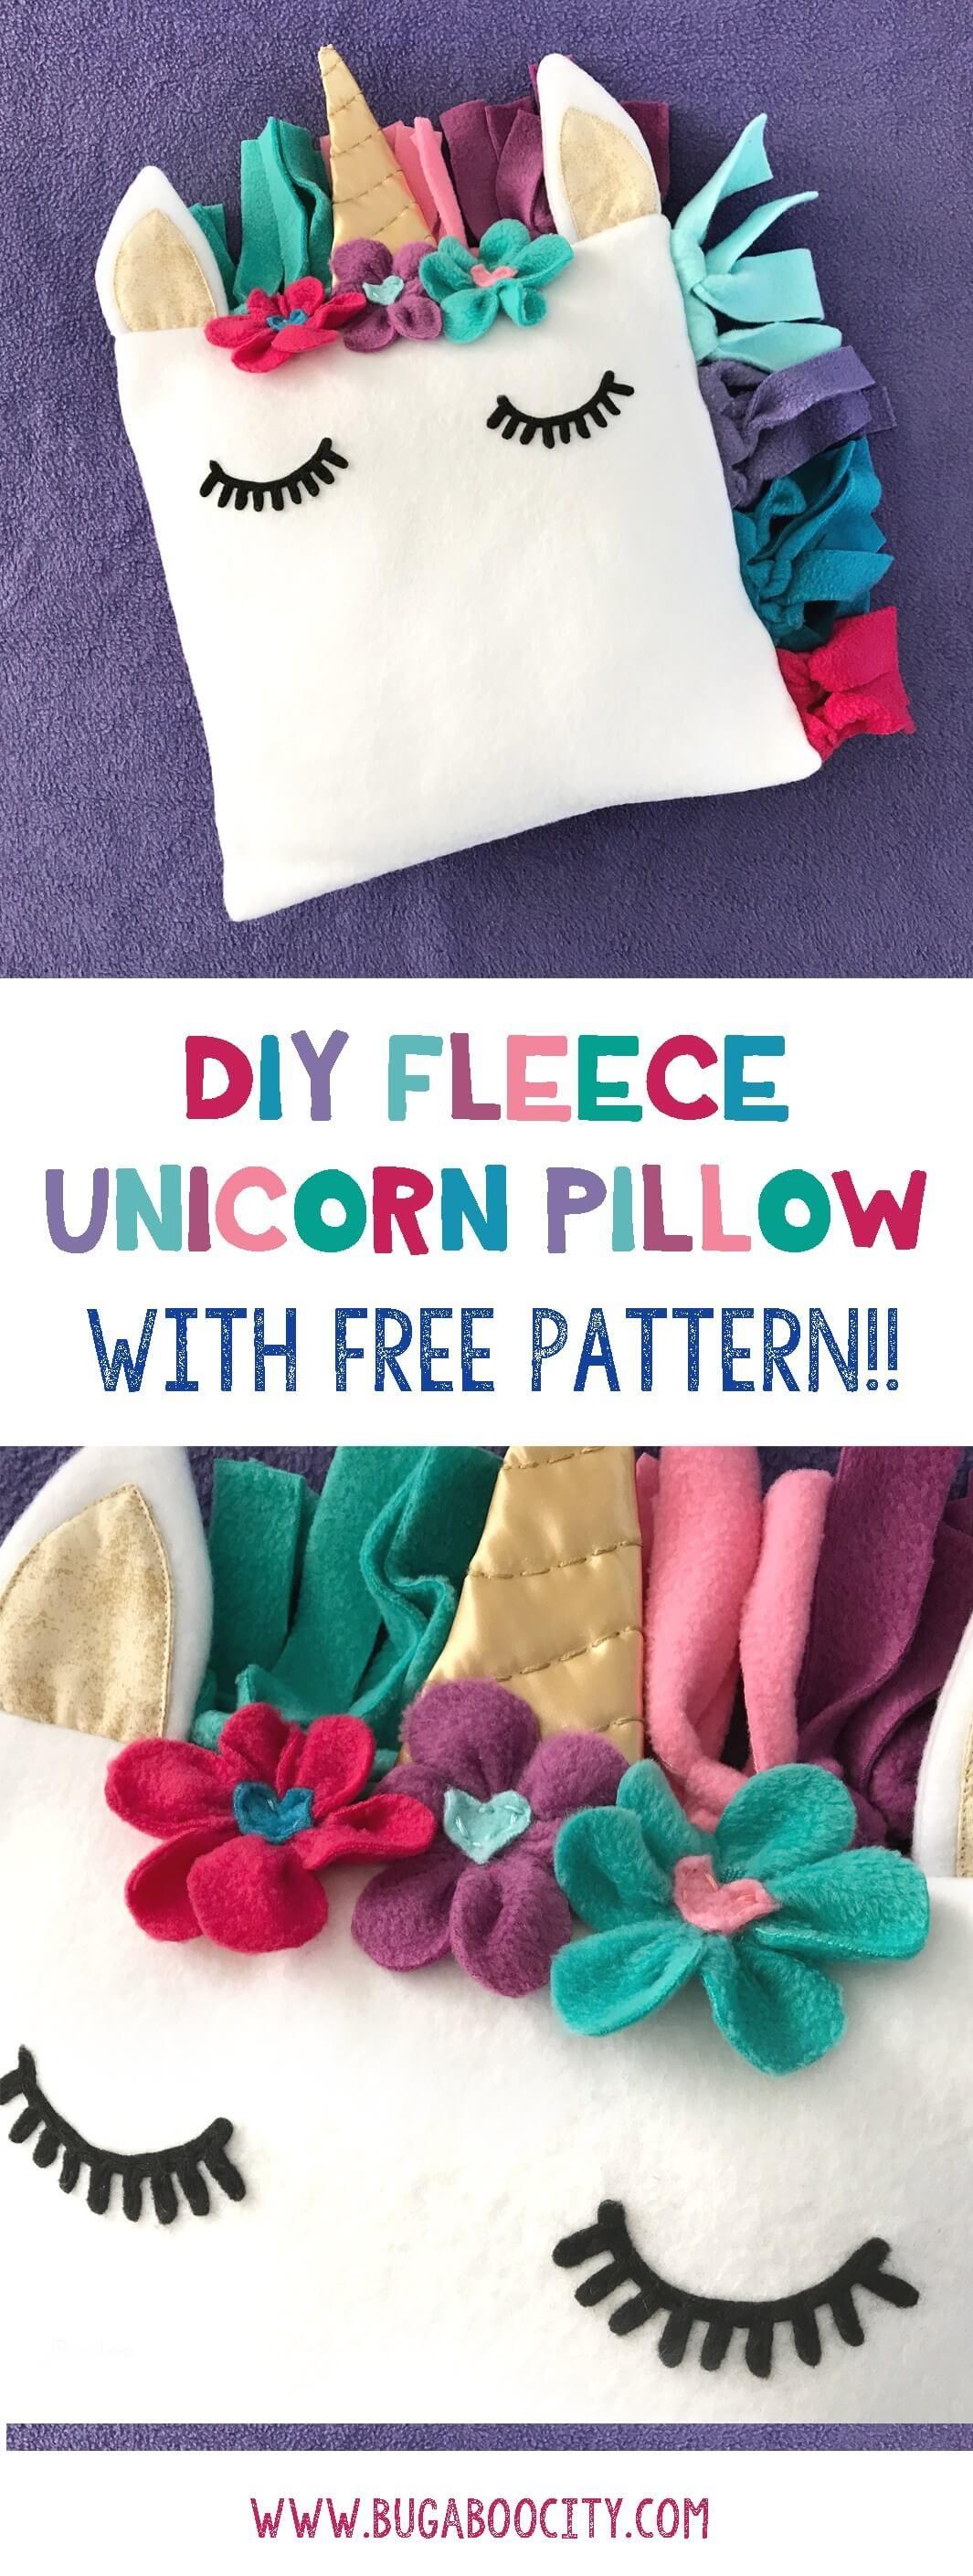 adorable diy unicorn pillow idea   einhorn kissen